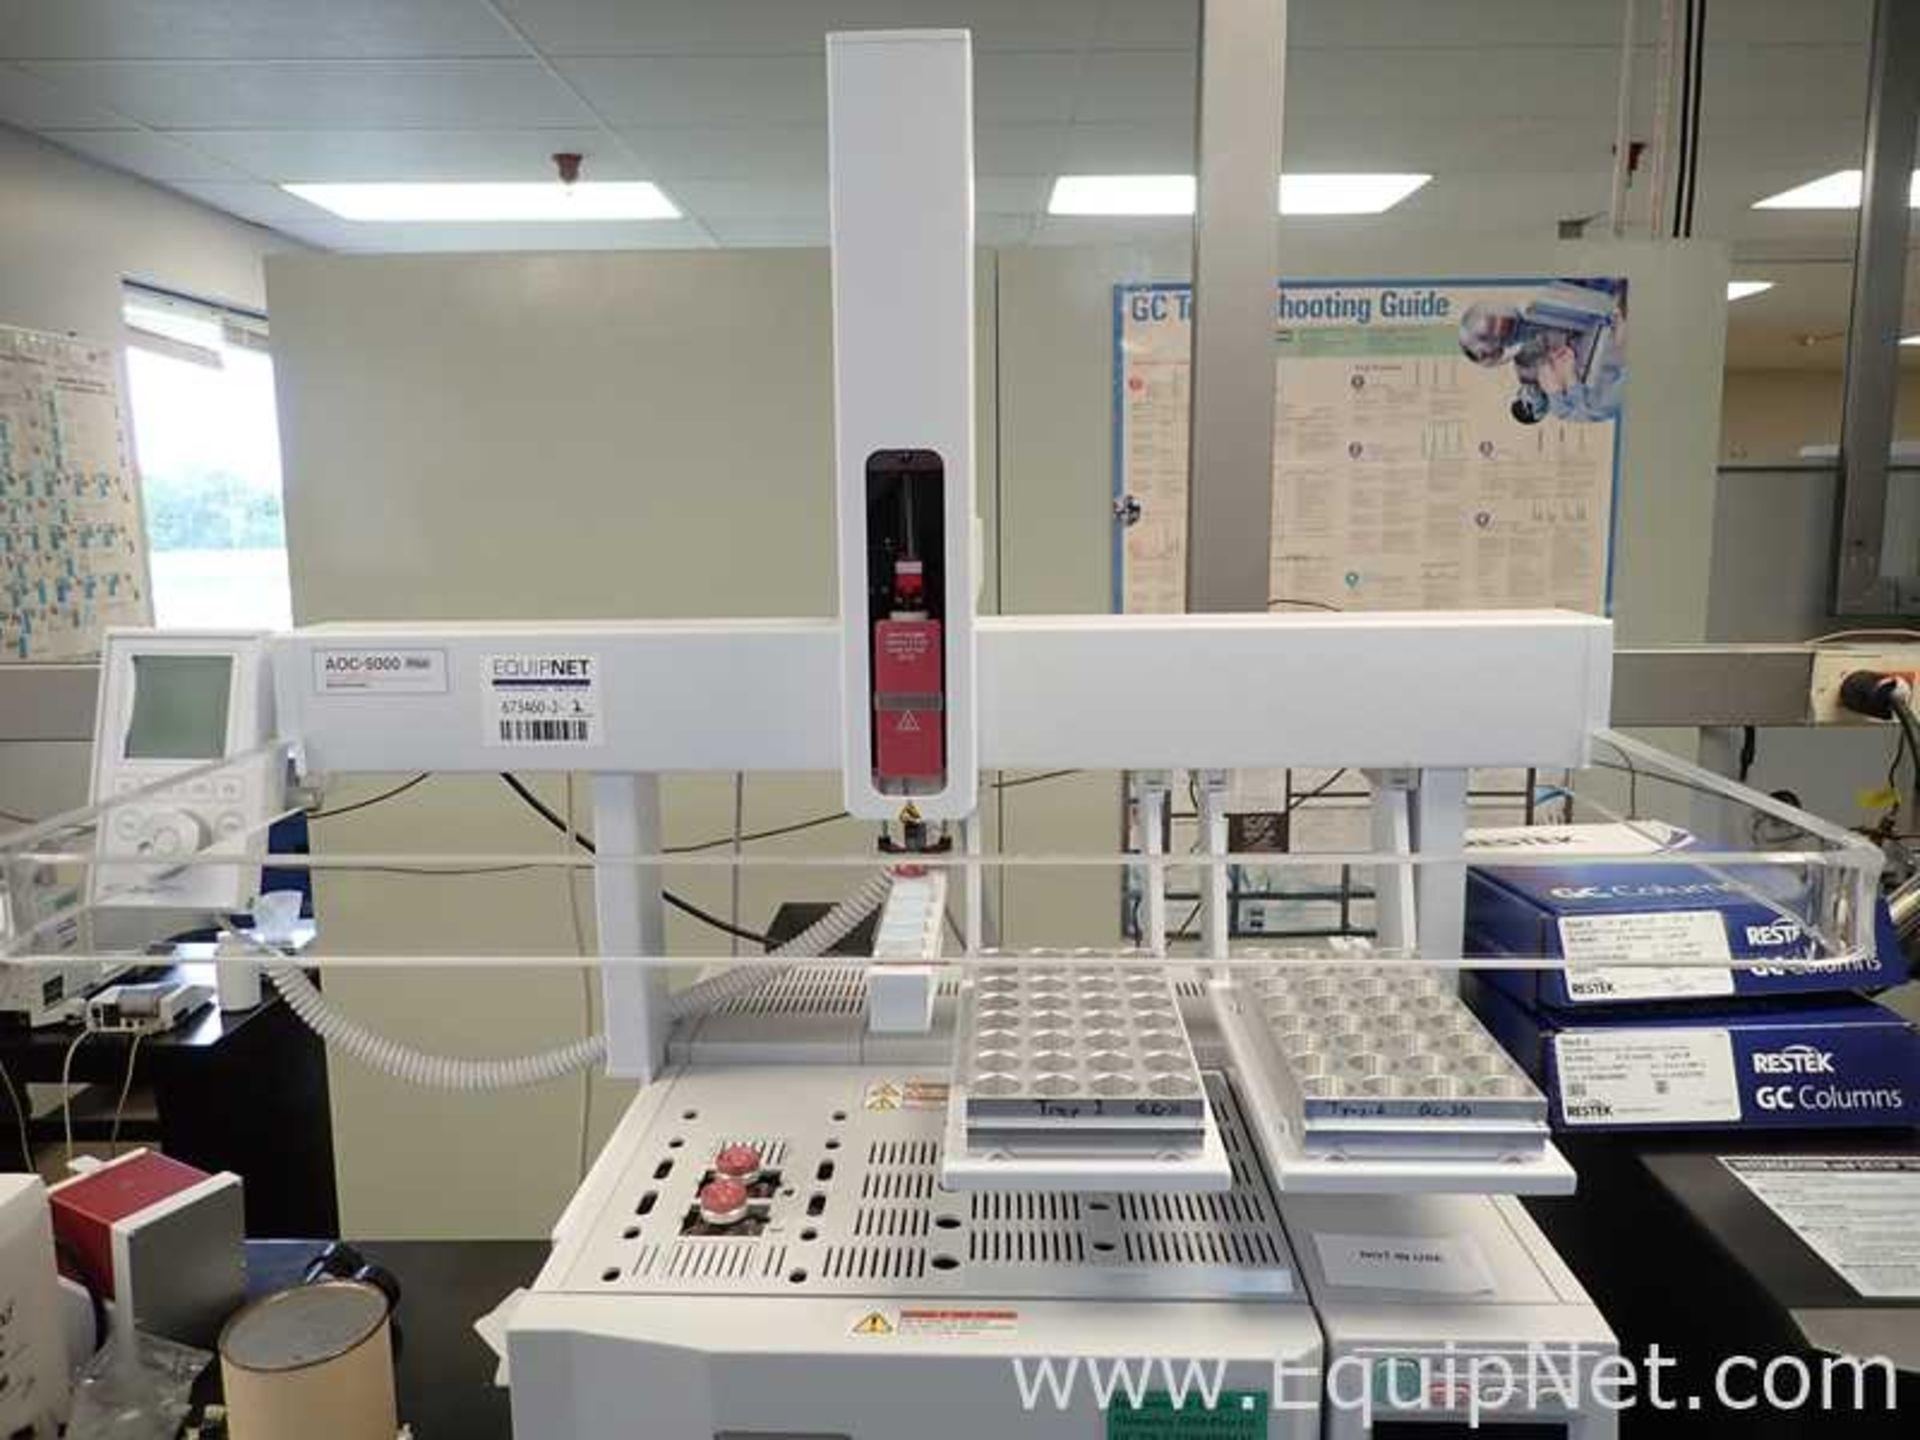 Shimadzu GC-2010 Gas Chromatograph with AOC-5000 Auto Injector - Image 3 of 7